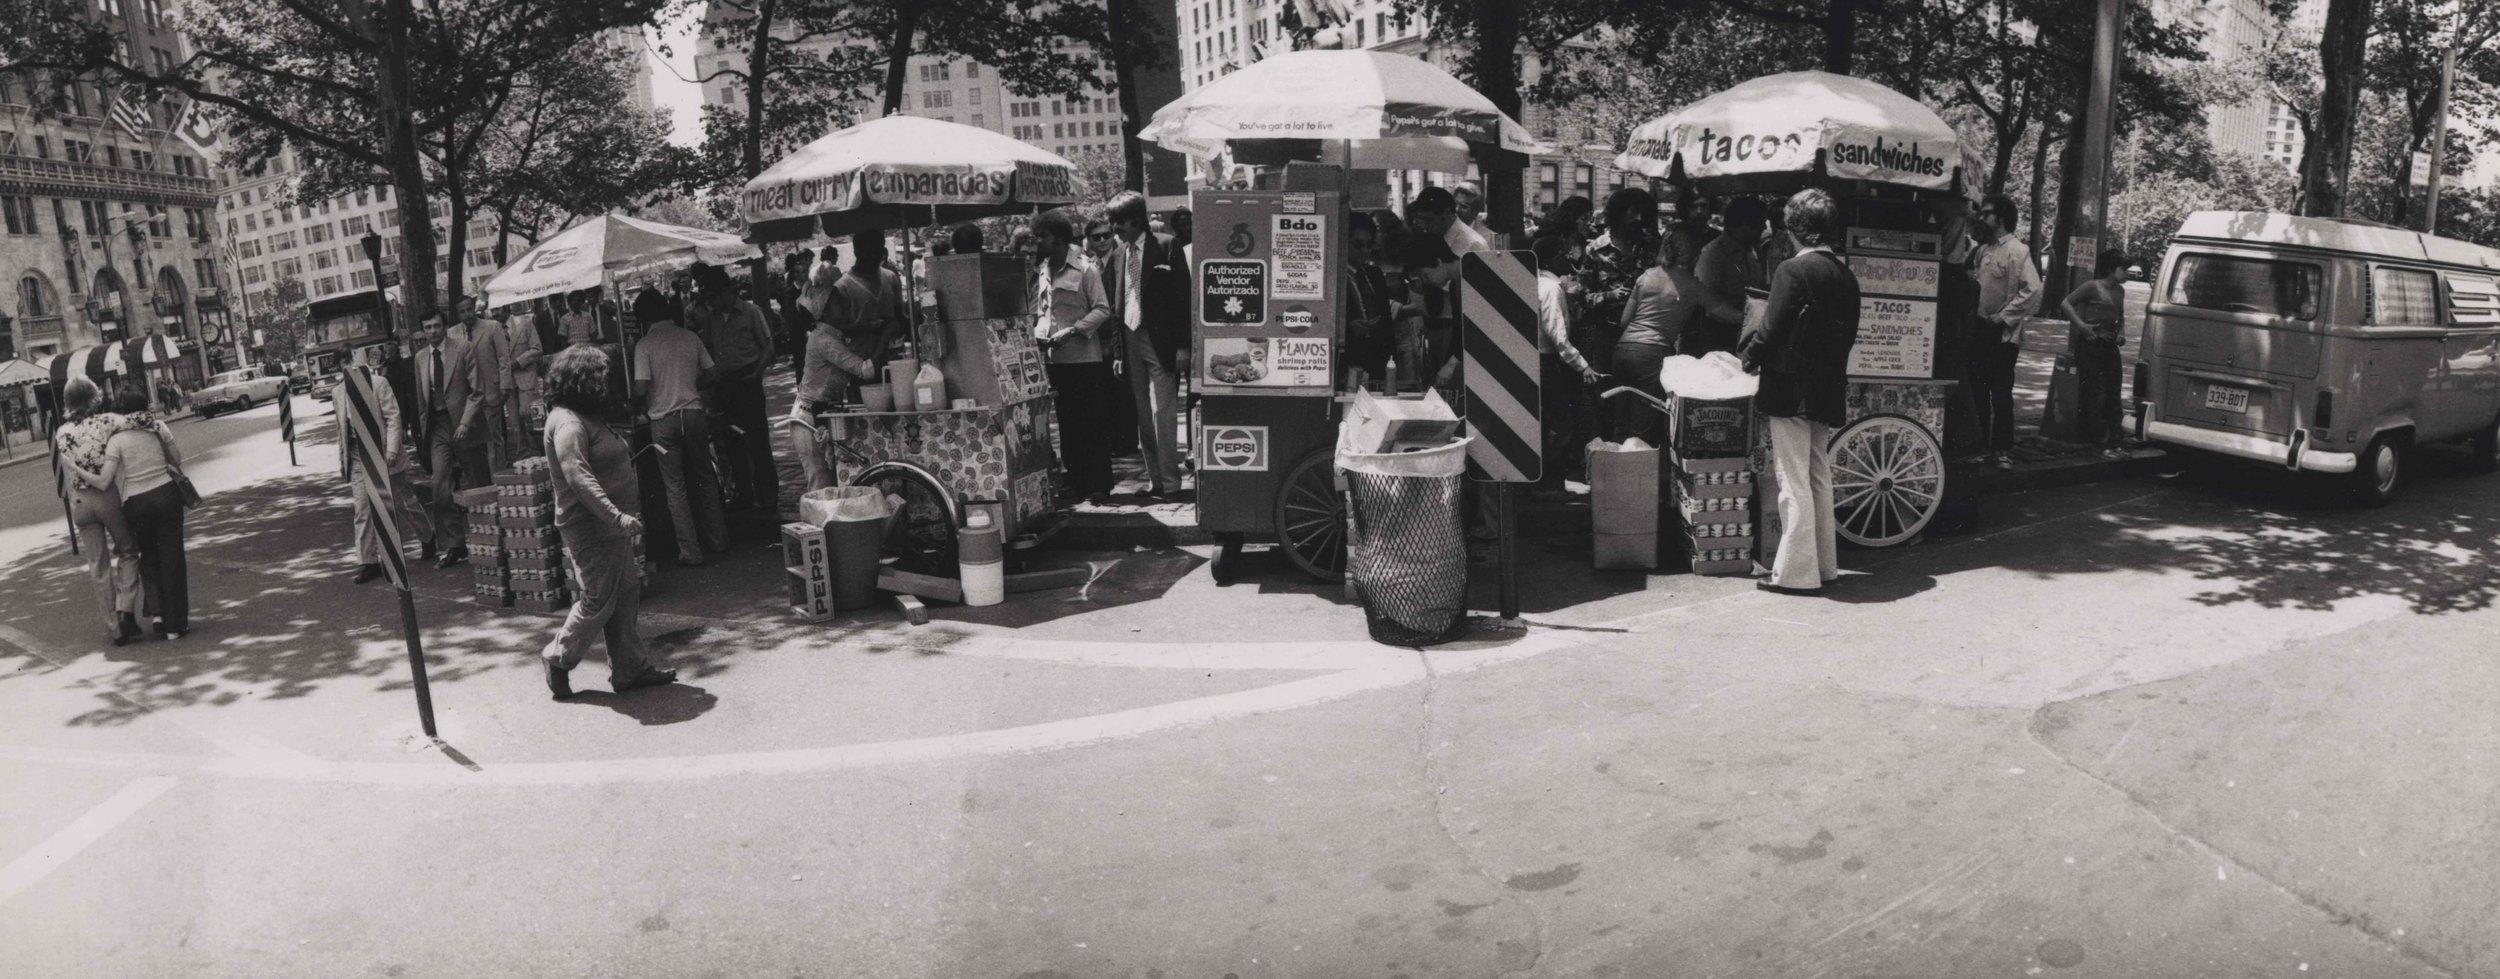 15_93_Empanadas, tacos, and other street food vendors_Dan Wynn Archive.jpeg